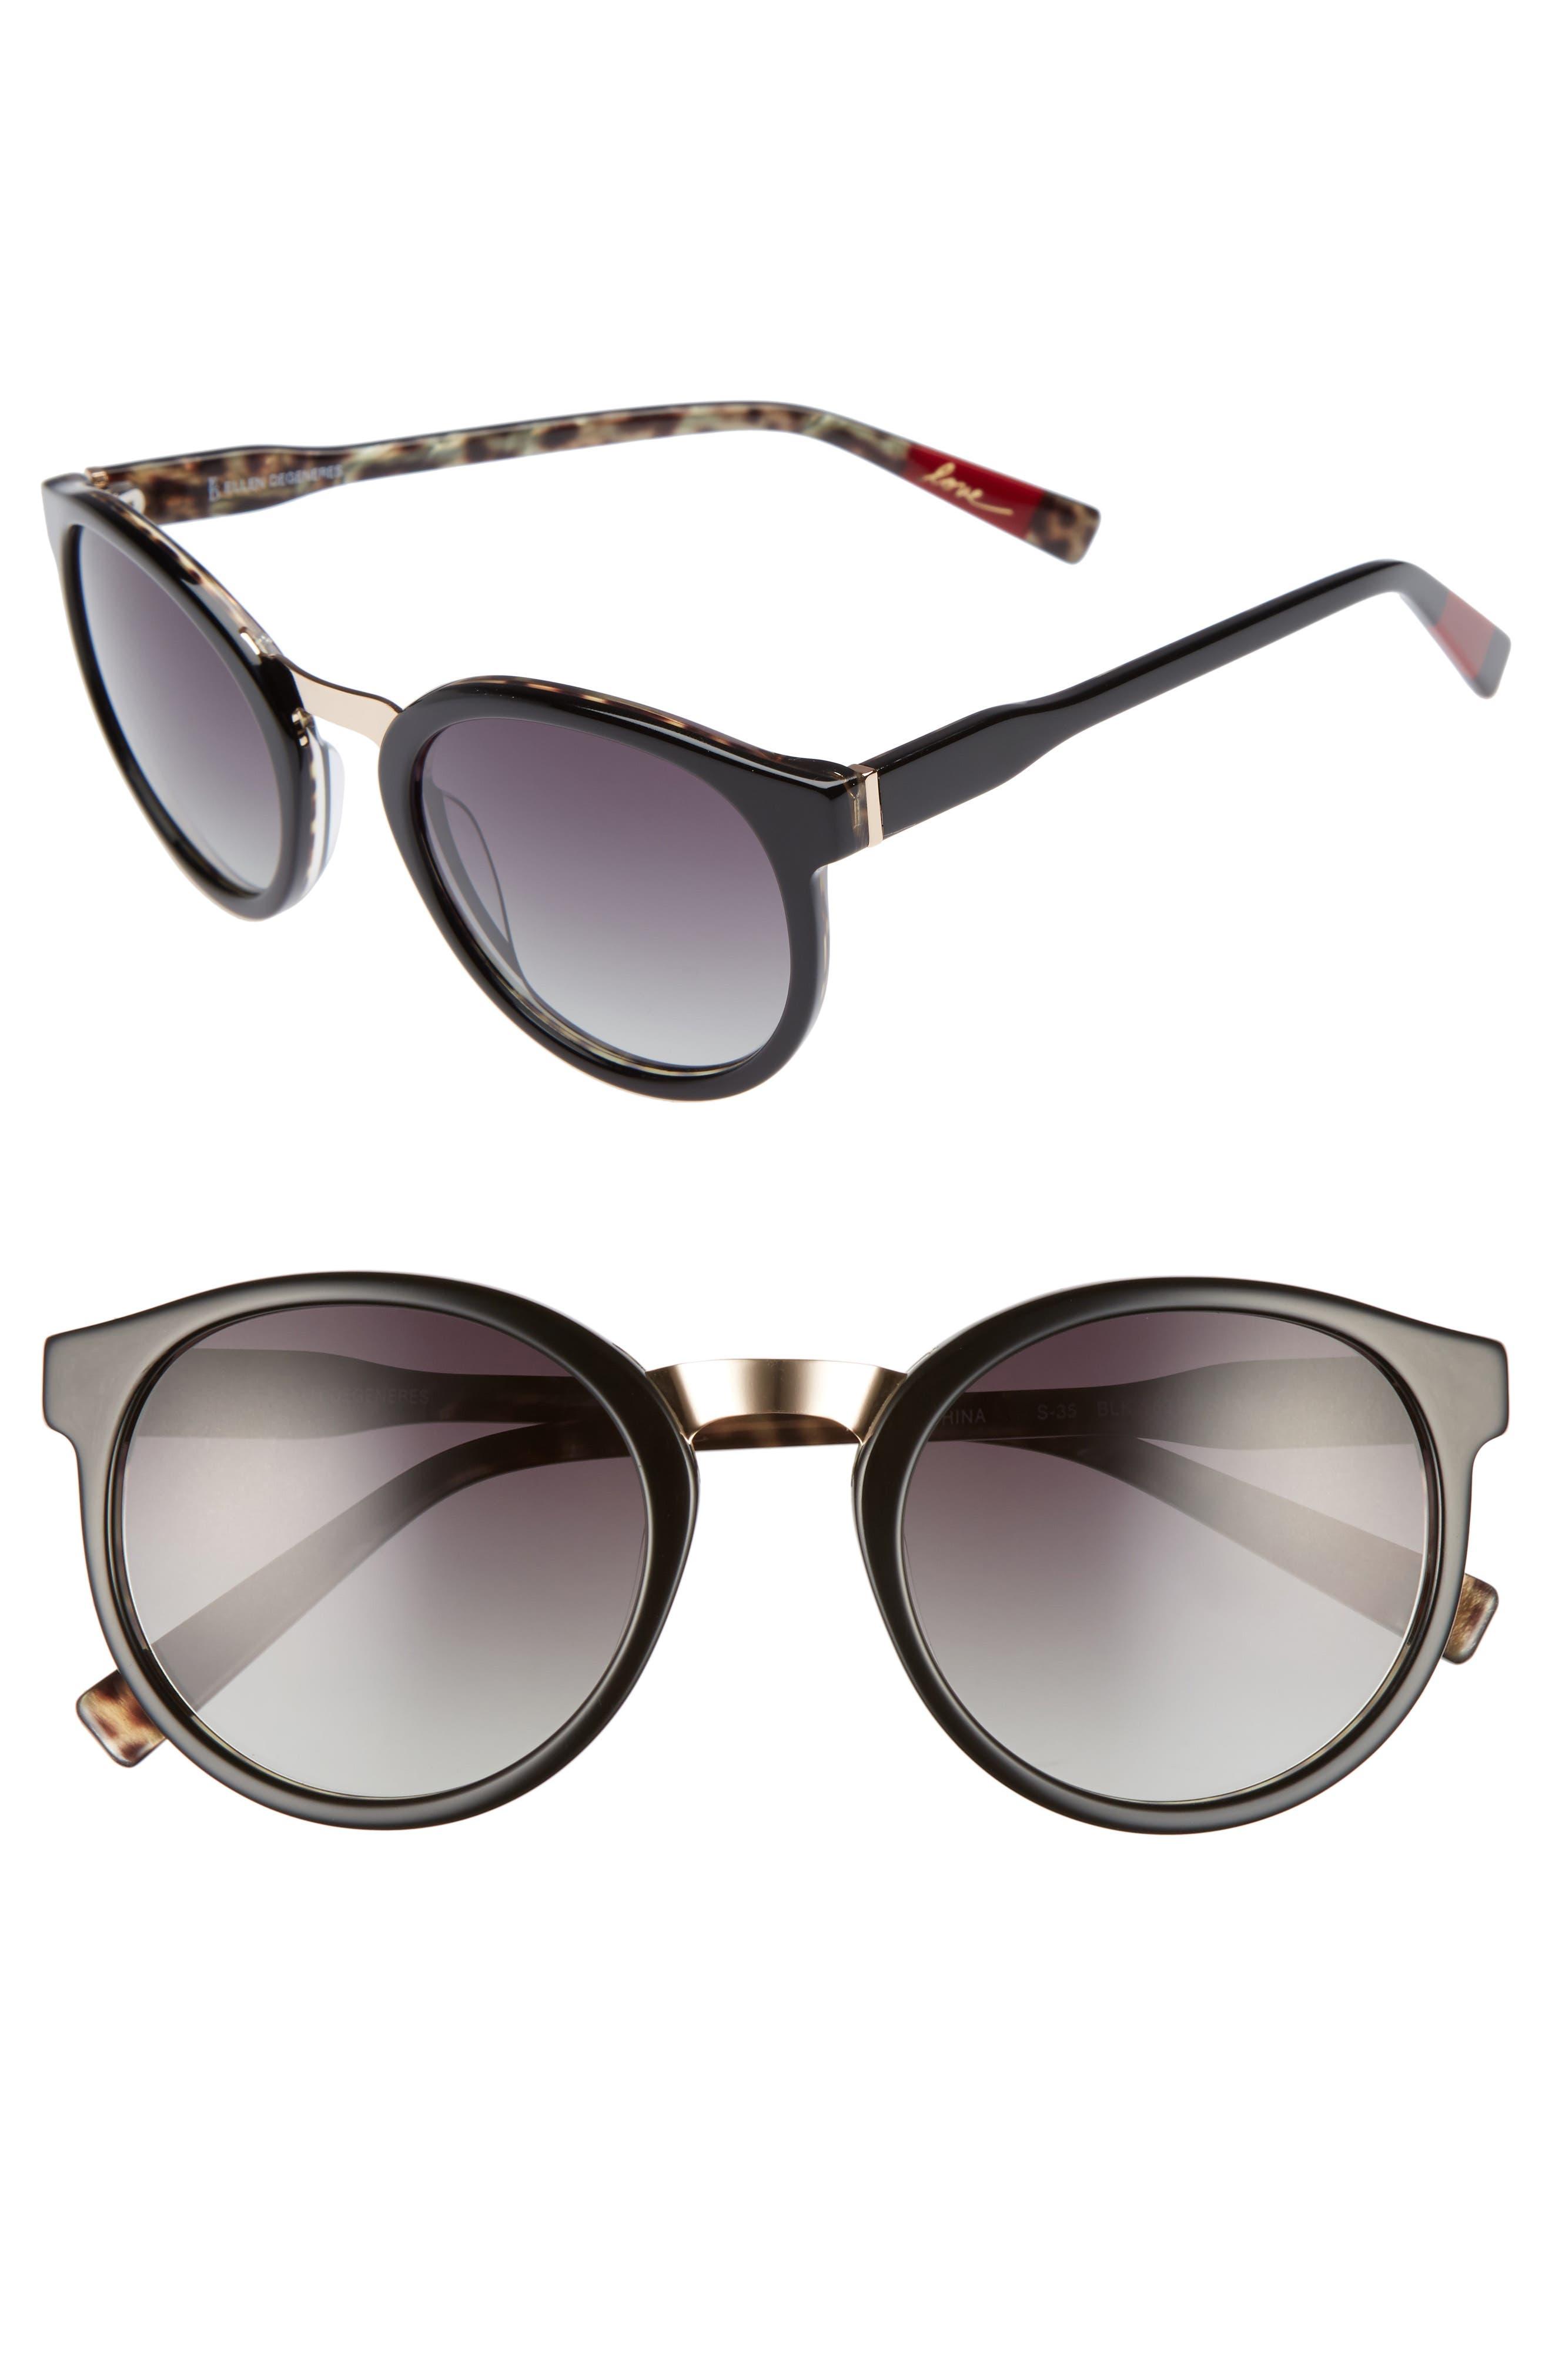 53mm Round Sunglasses,                             Main thumbnail 1, color,                             001